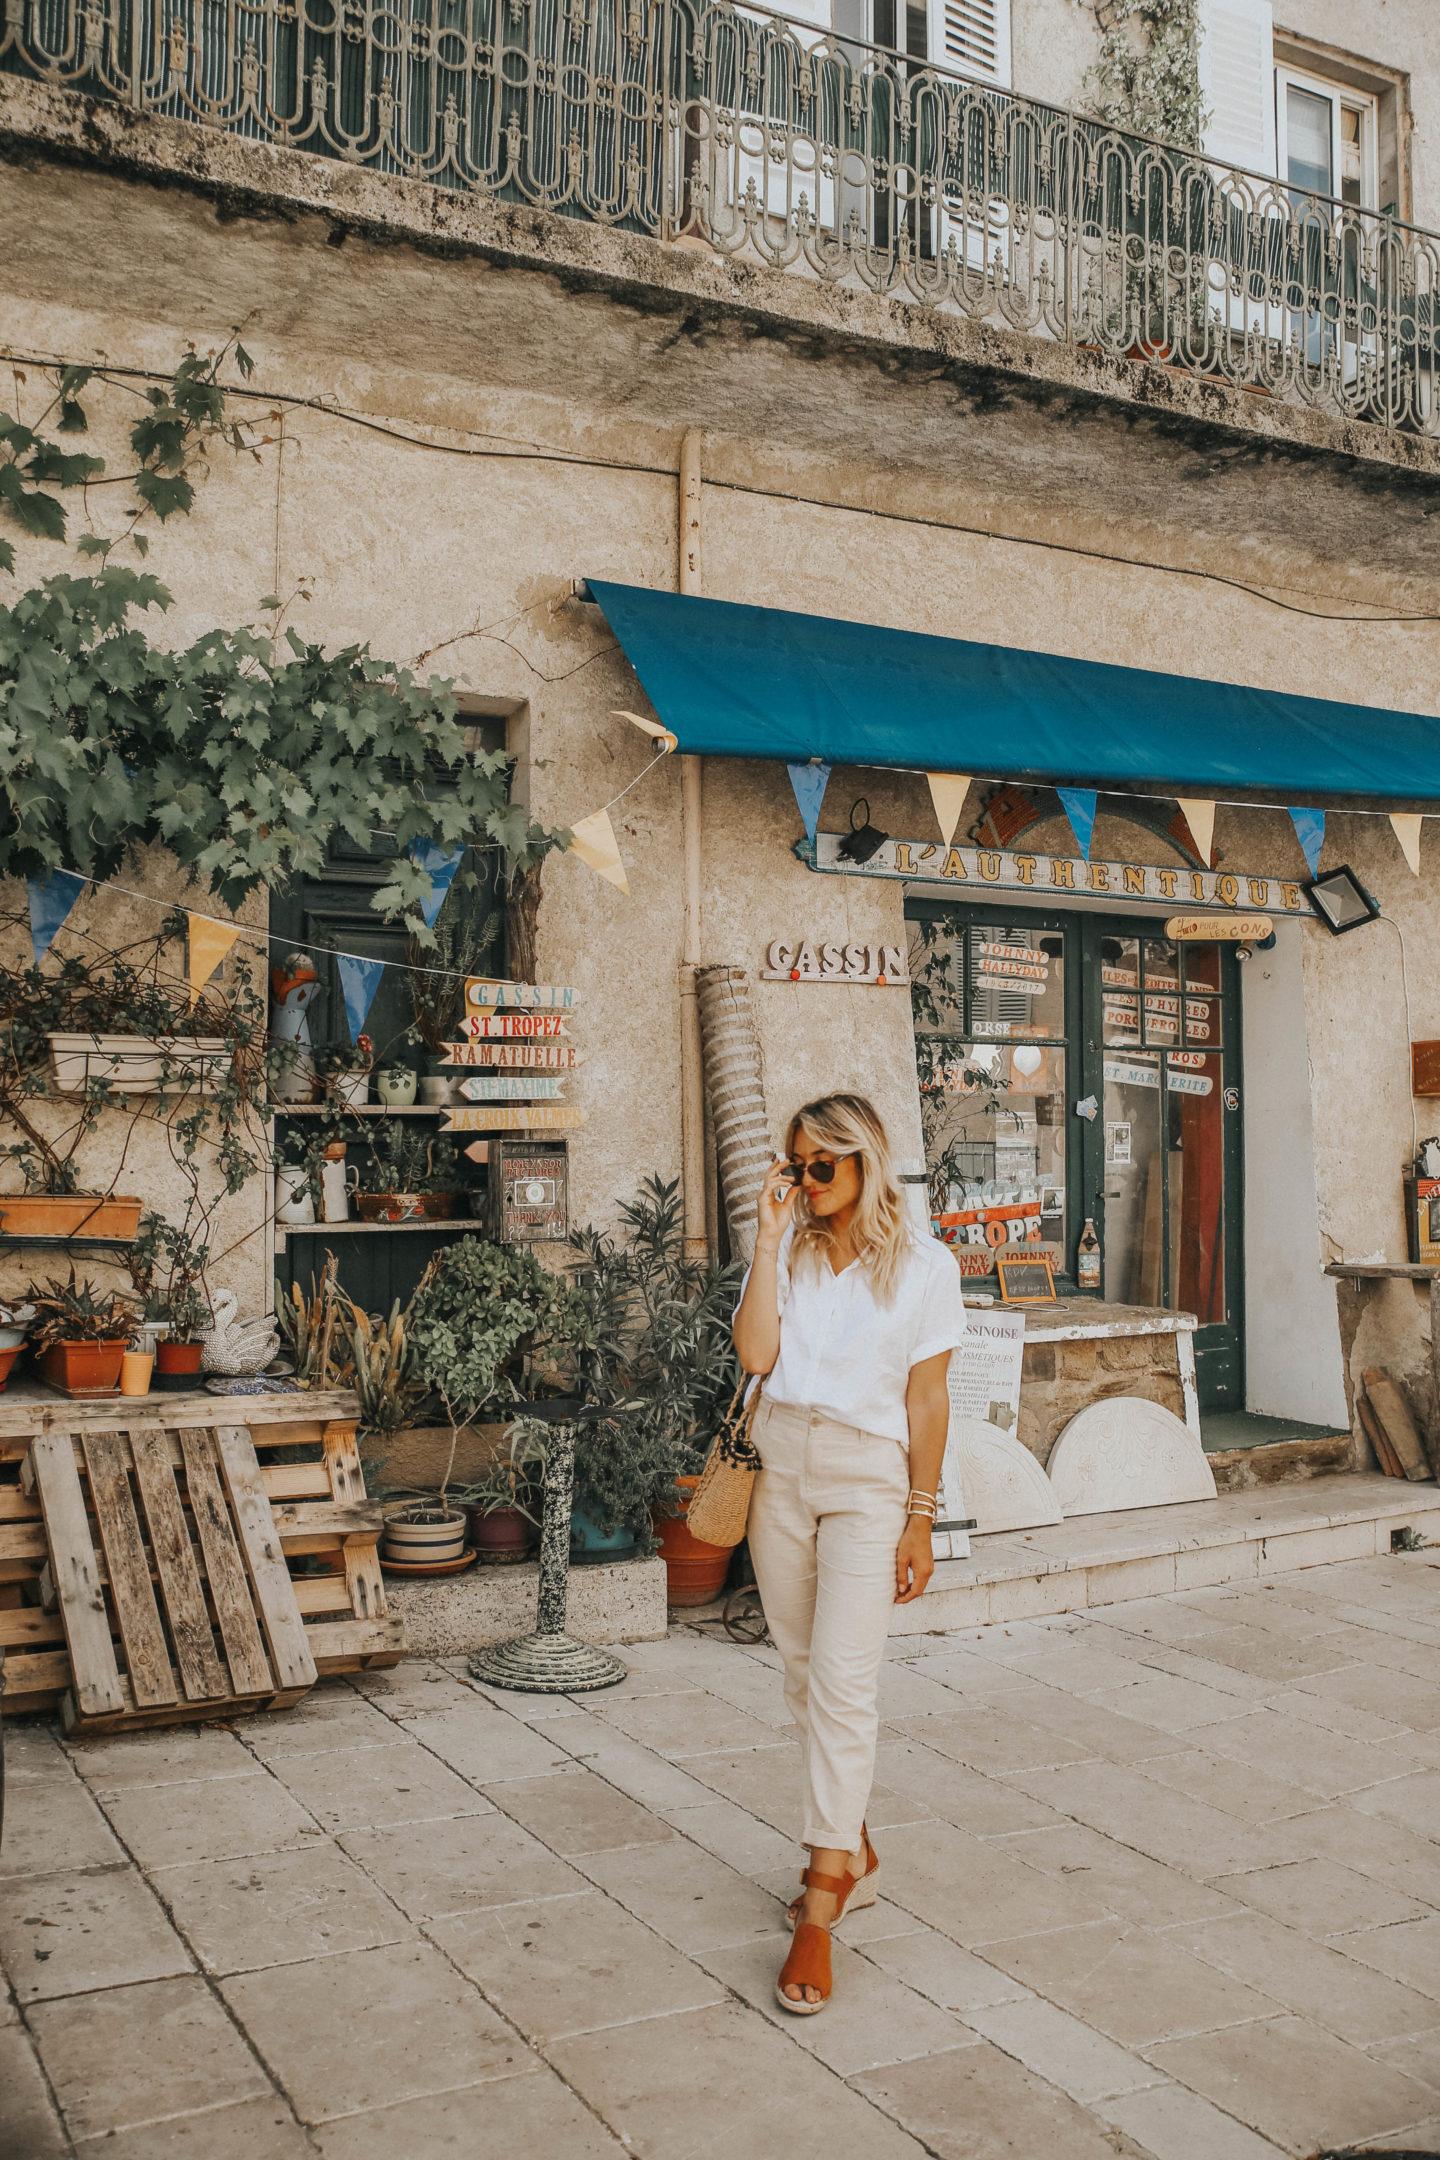 Visiter Gassin - Blondie Baby blog mode Paris et voyages